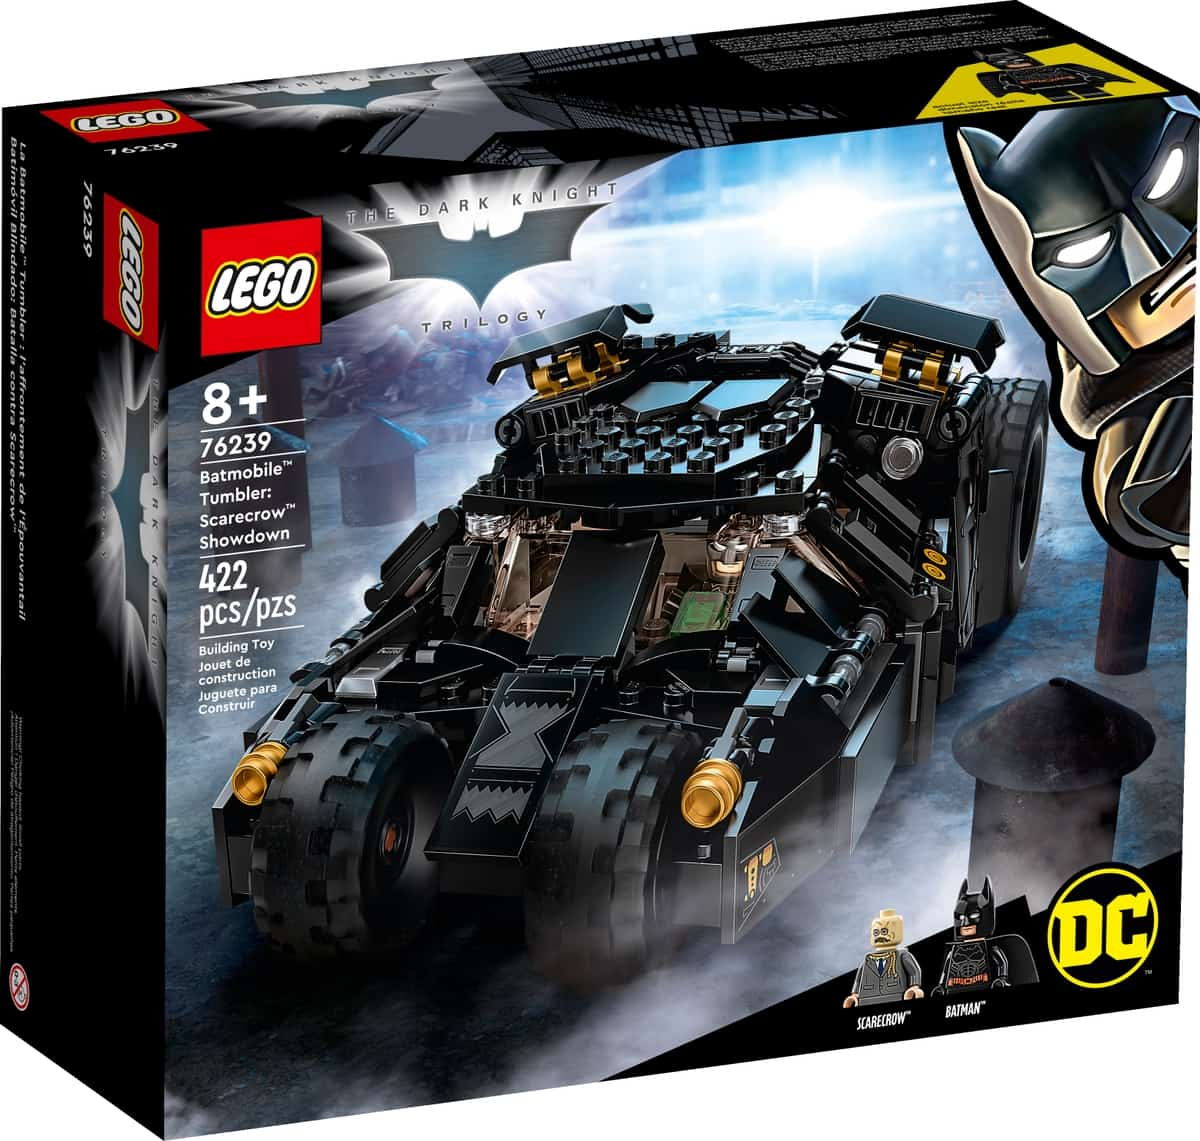 lego 76239 dc batman batmobile tumbler auto scarecrow selkkaus